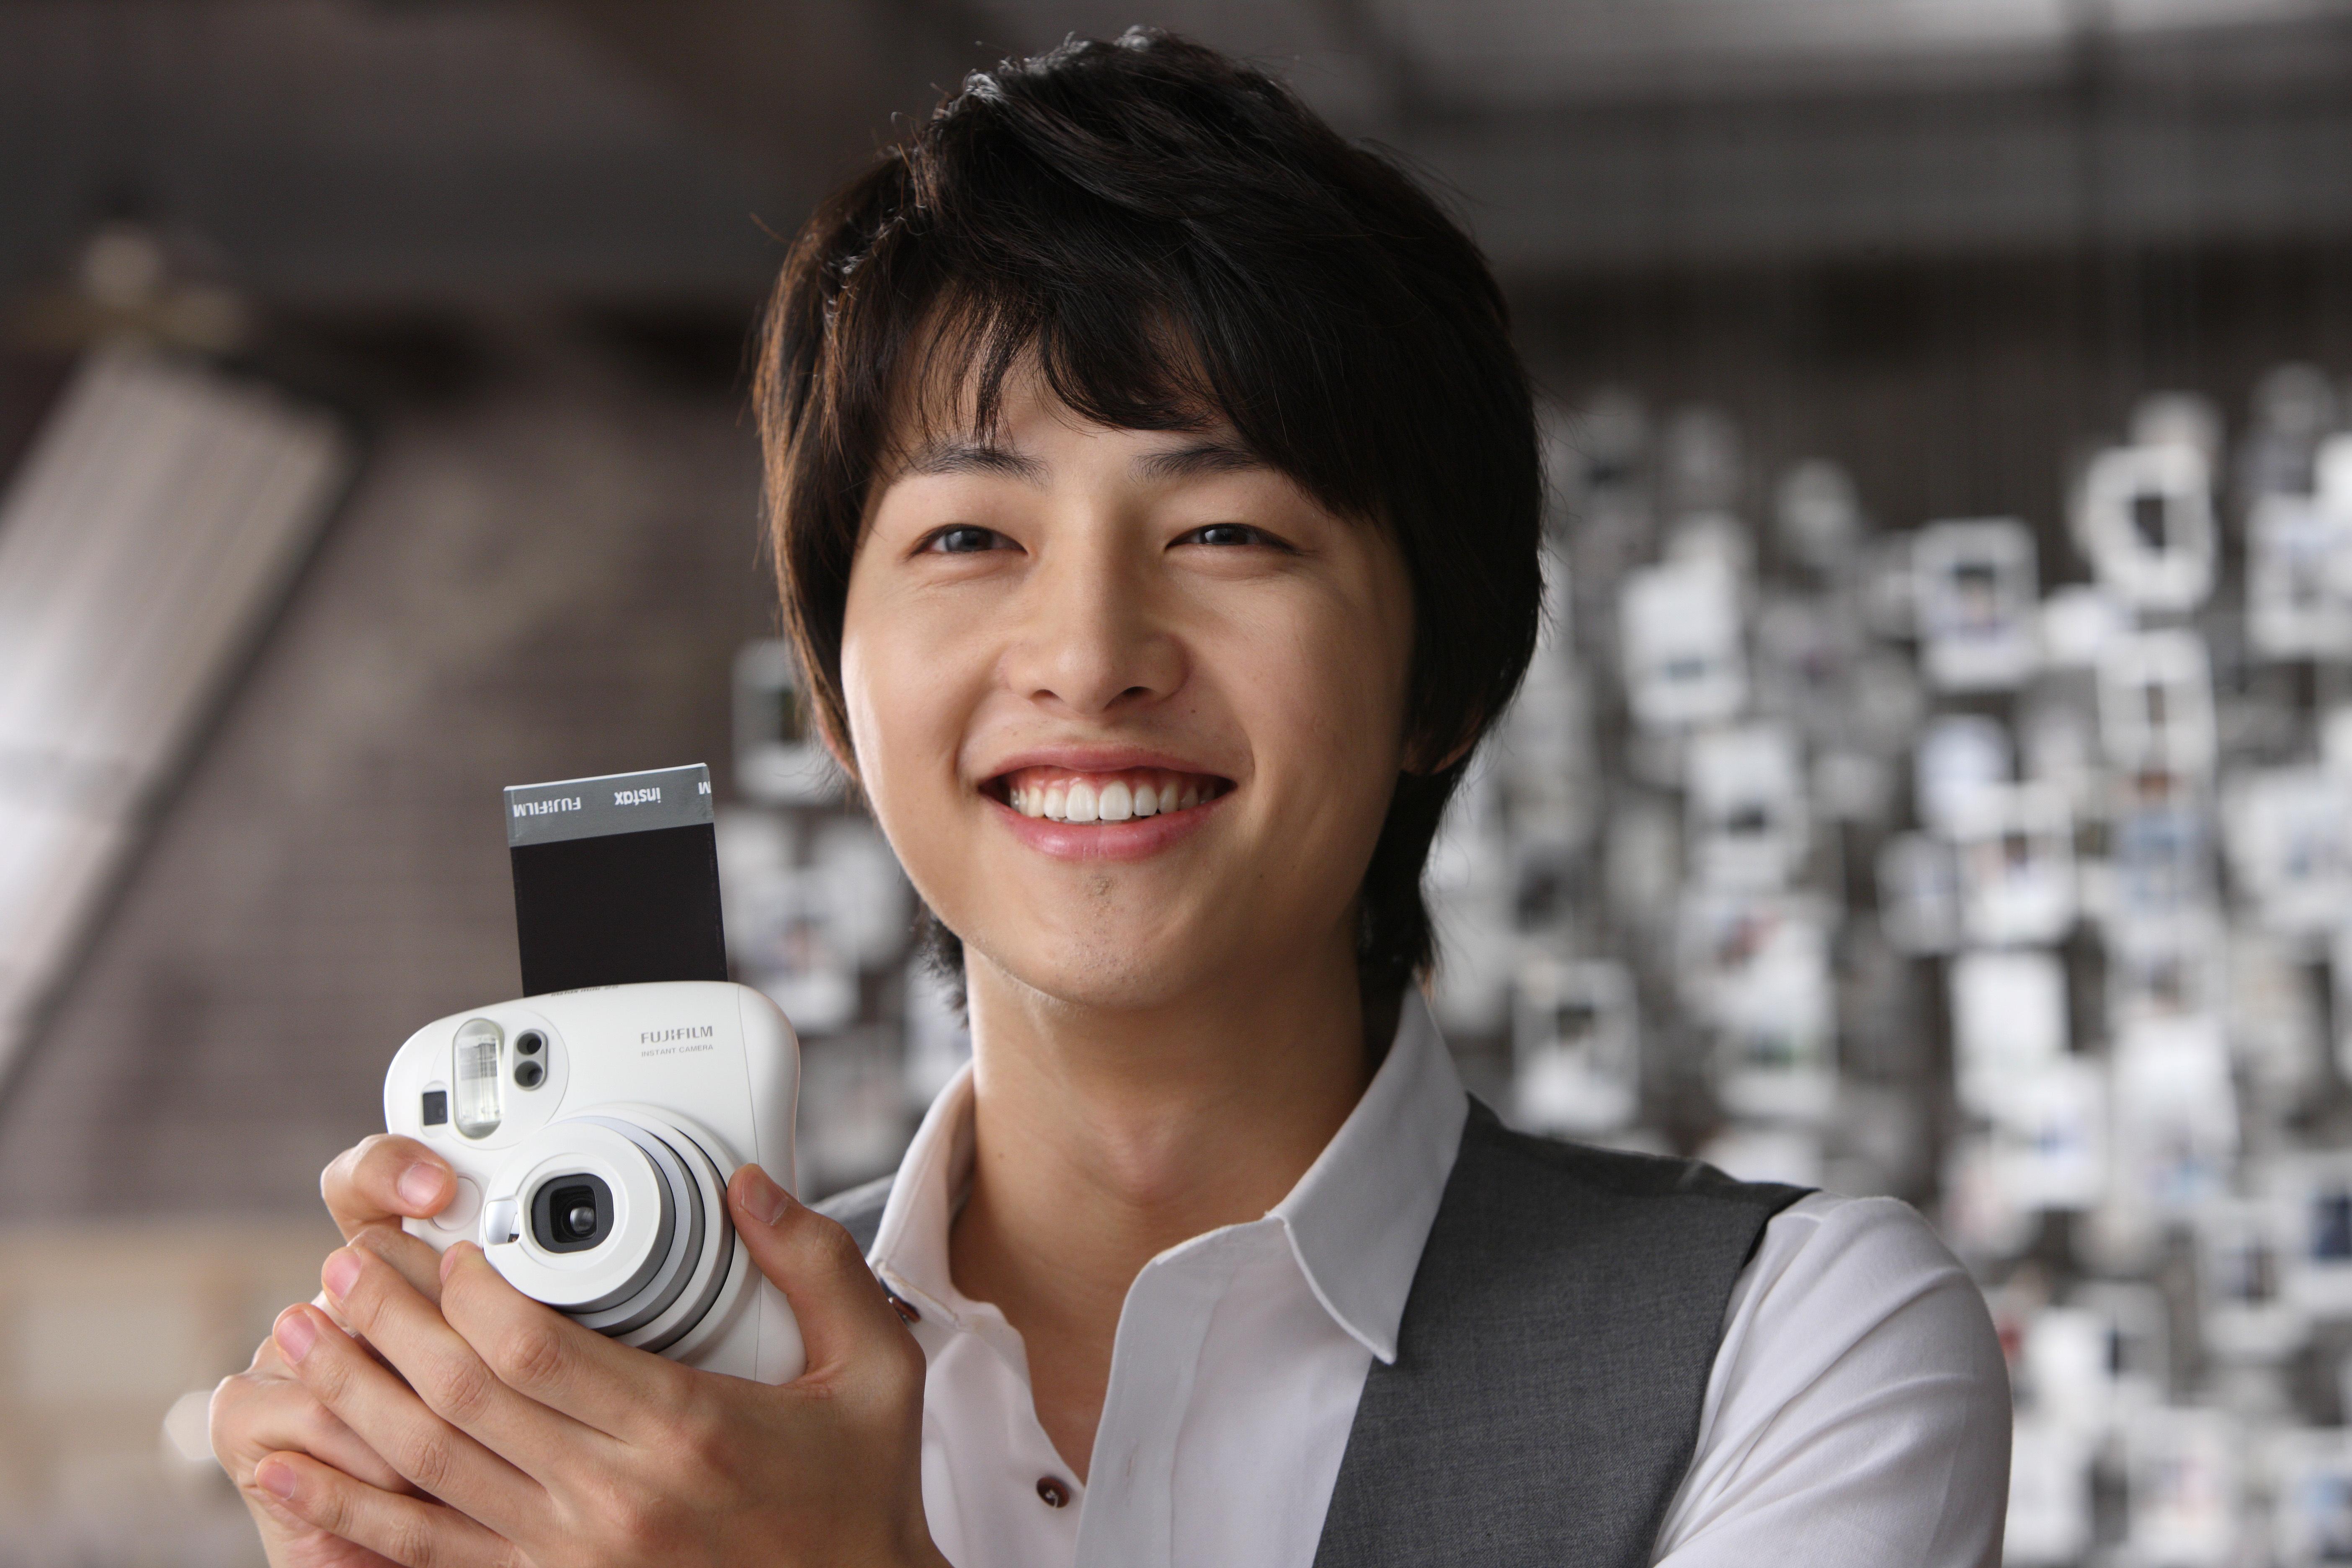 Song Joong Ki Hd Desktop